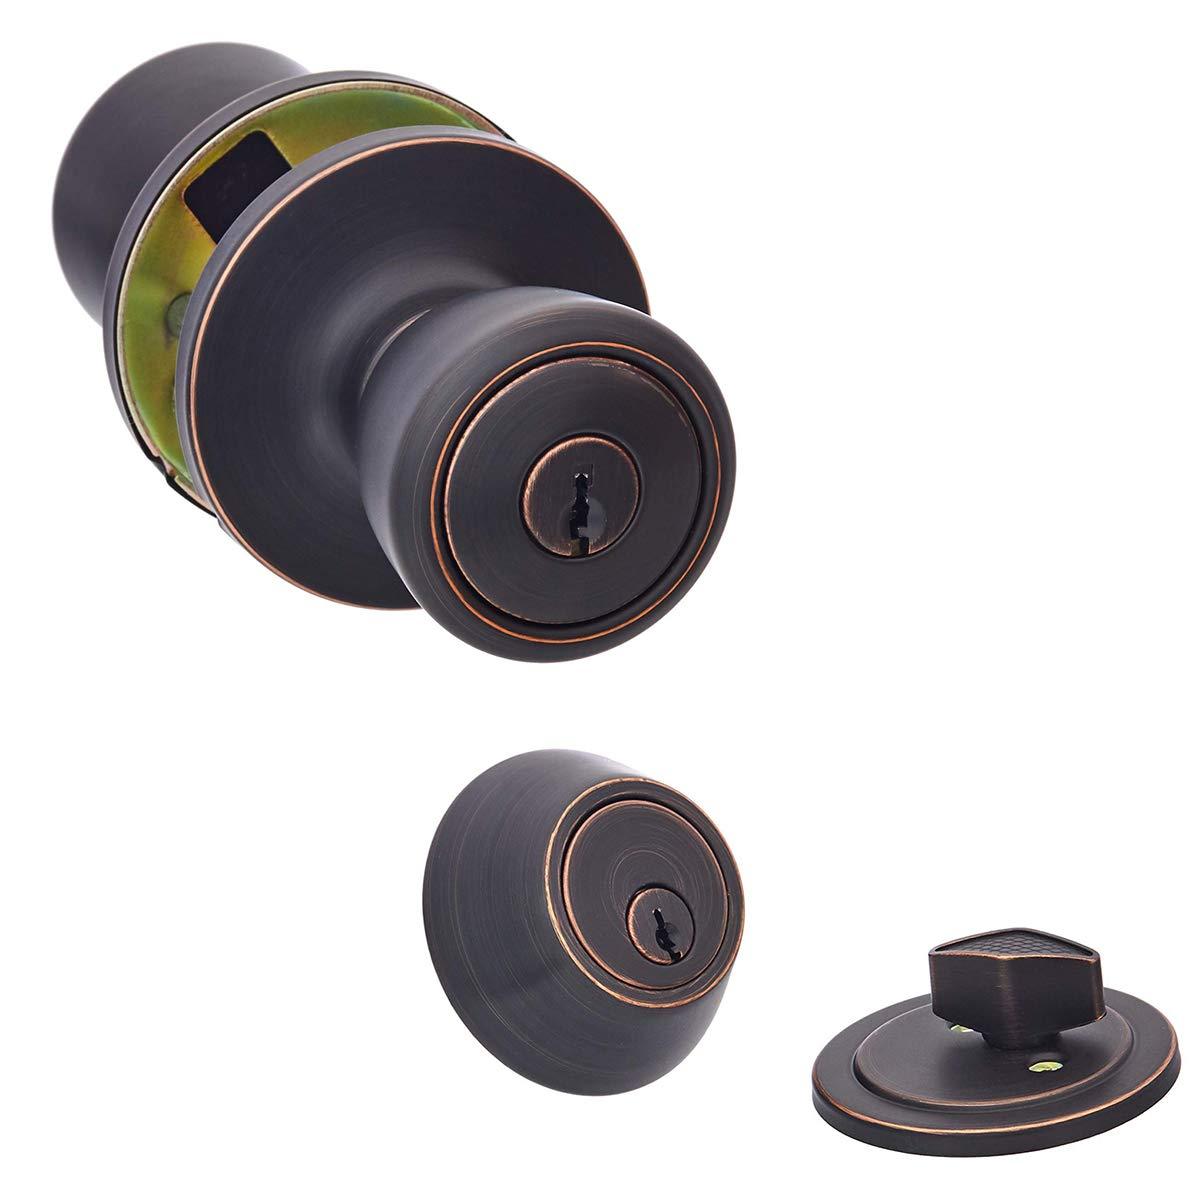 AmazonBasics Entry Door Knob and Deadbolt - Bell - Oil Rubbed Bronze